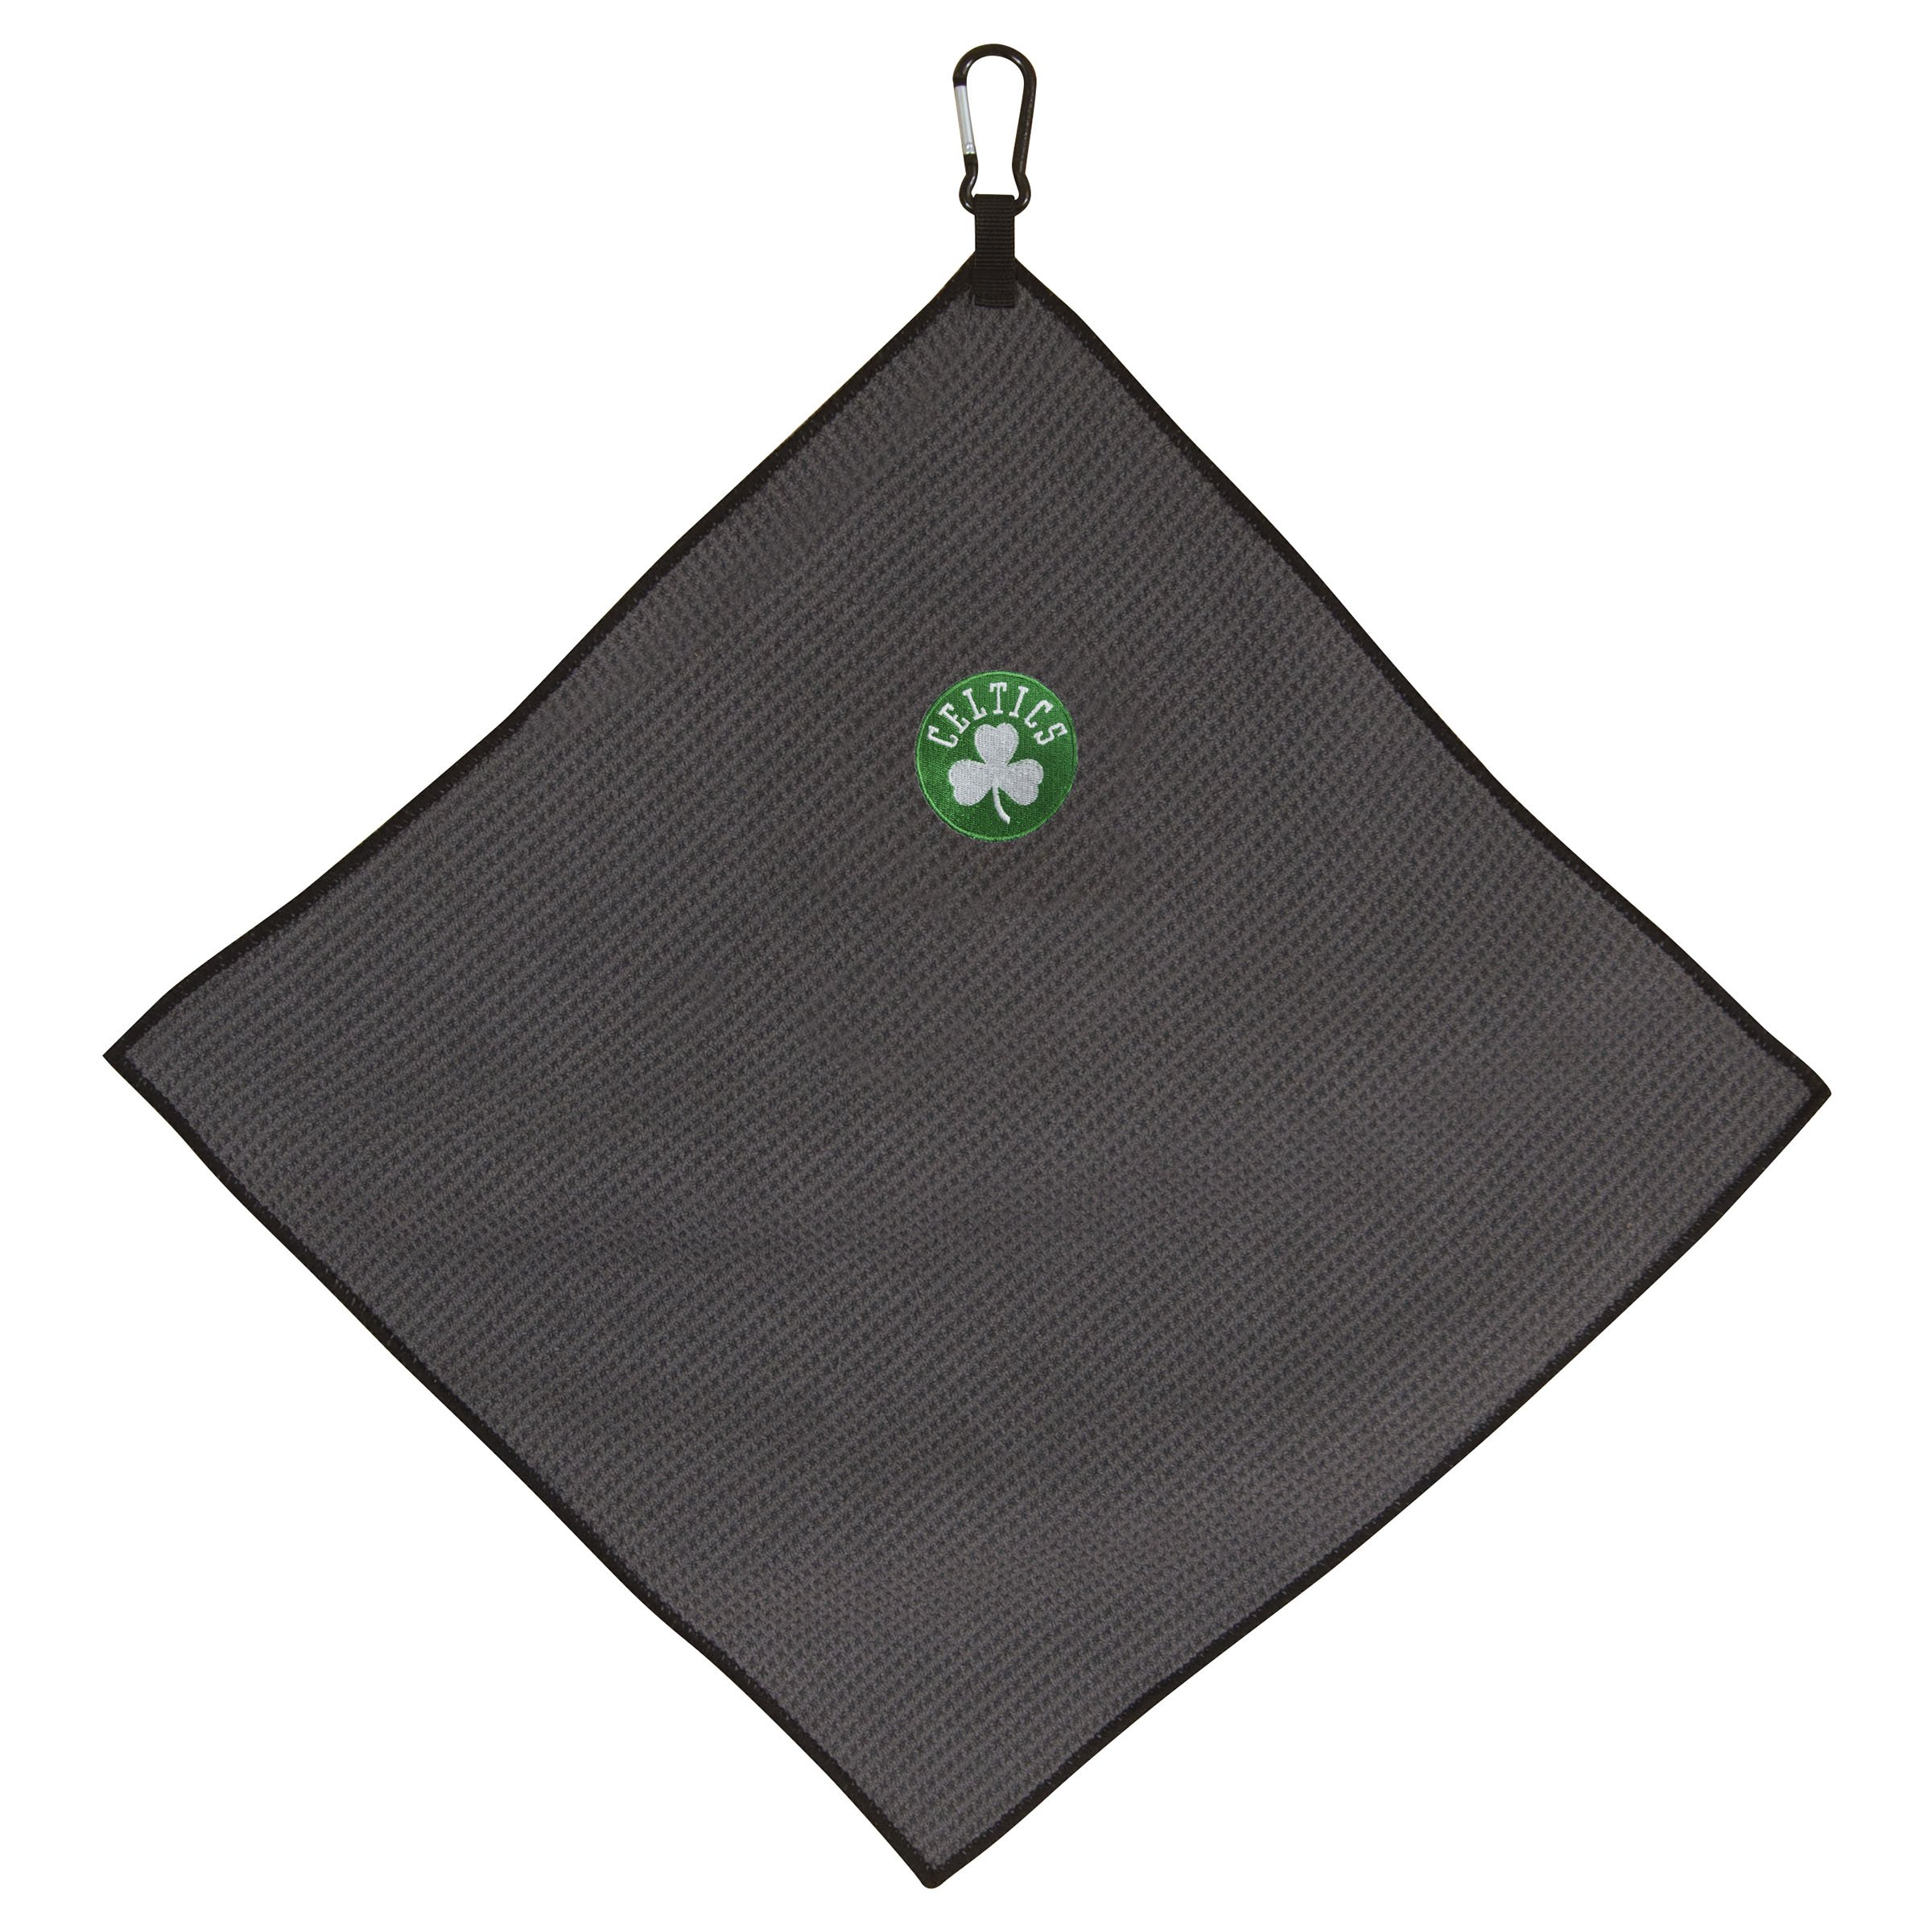 Team Effort NBA Boston Celtics 15'' x 15'' Grey Microfiber Towel15 x 15'' Grey Microfiber Towel, NA